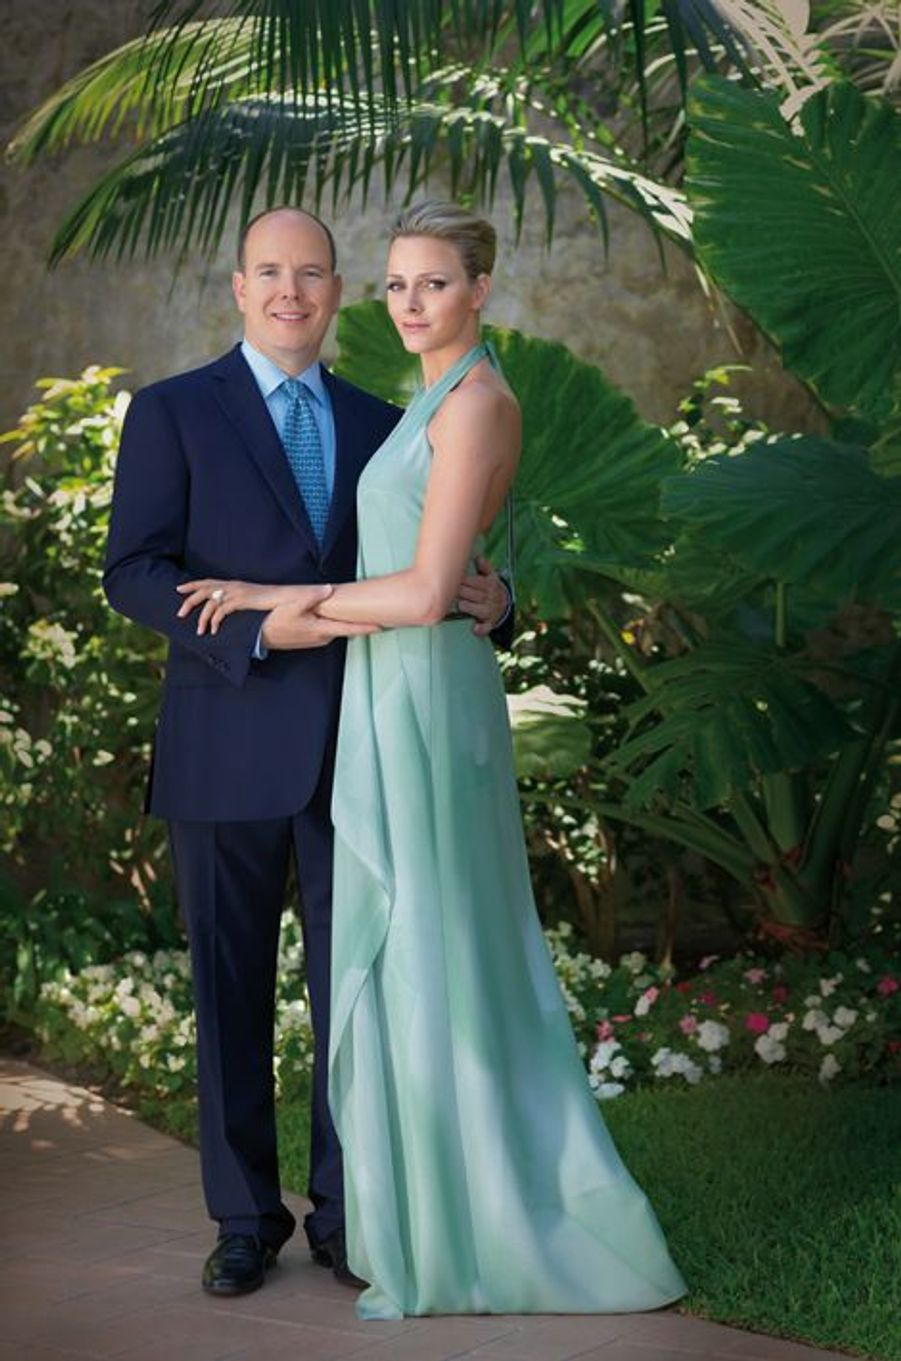 Le prince Albert II de Monaco et Charlène Wittstock, le 23 juin 2010